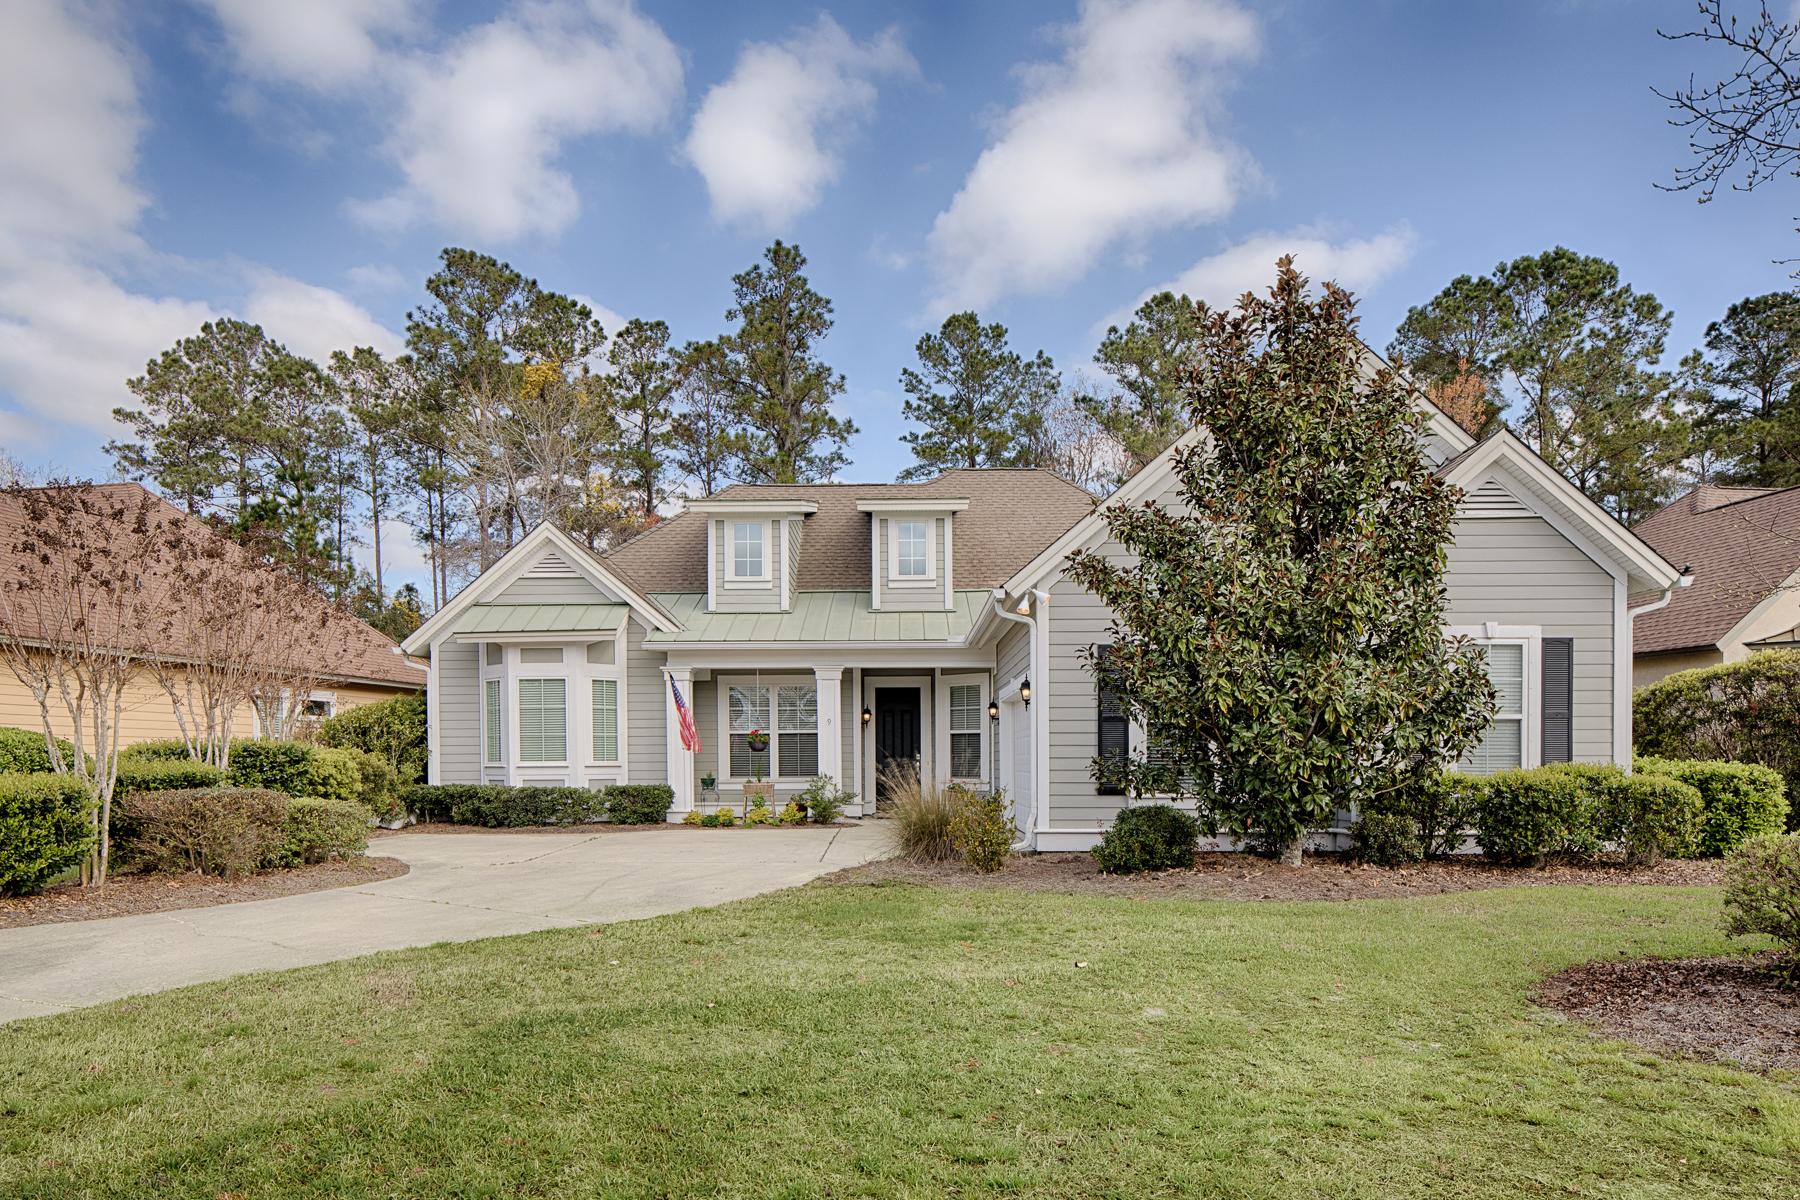 Single Family Home for Sale at 9 Weymouth Circle 9 Weymouth Circle Bluffton, South Carolina 29910 United States